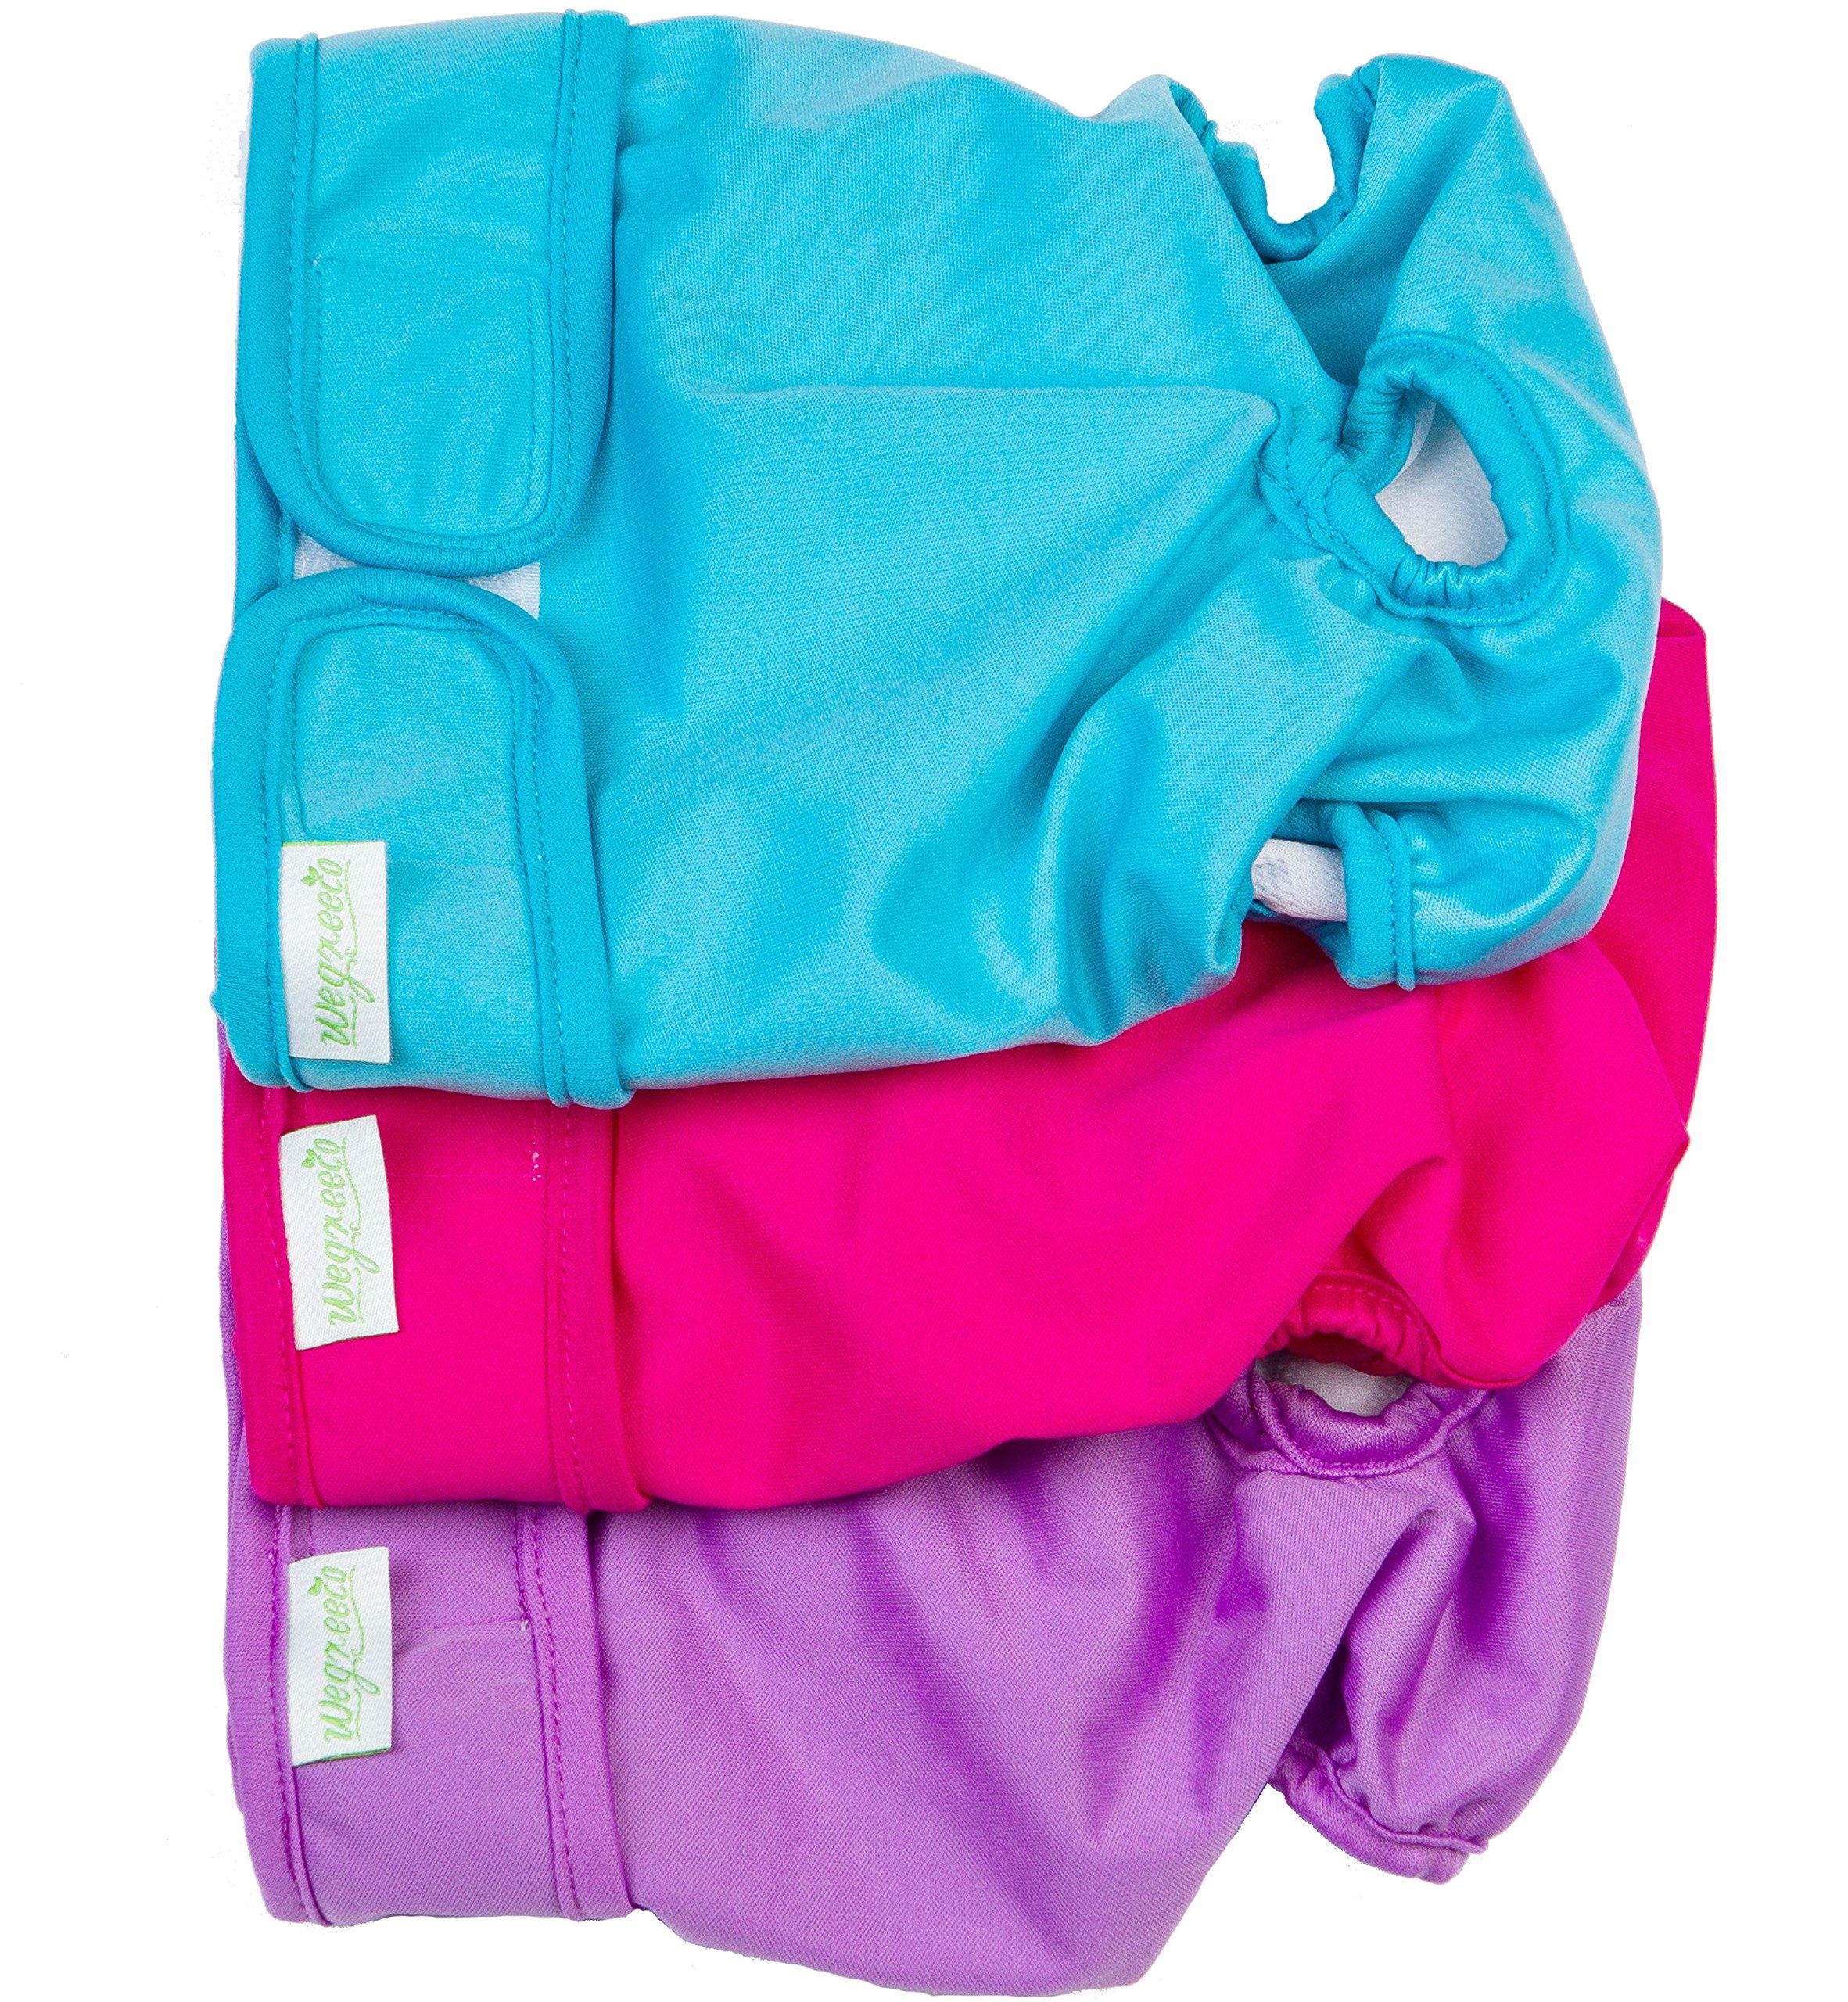 Wegreeco Washable Reusable Premium Dog Diapers, Medium, Bright Color, for Female Dog, Pack of 3